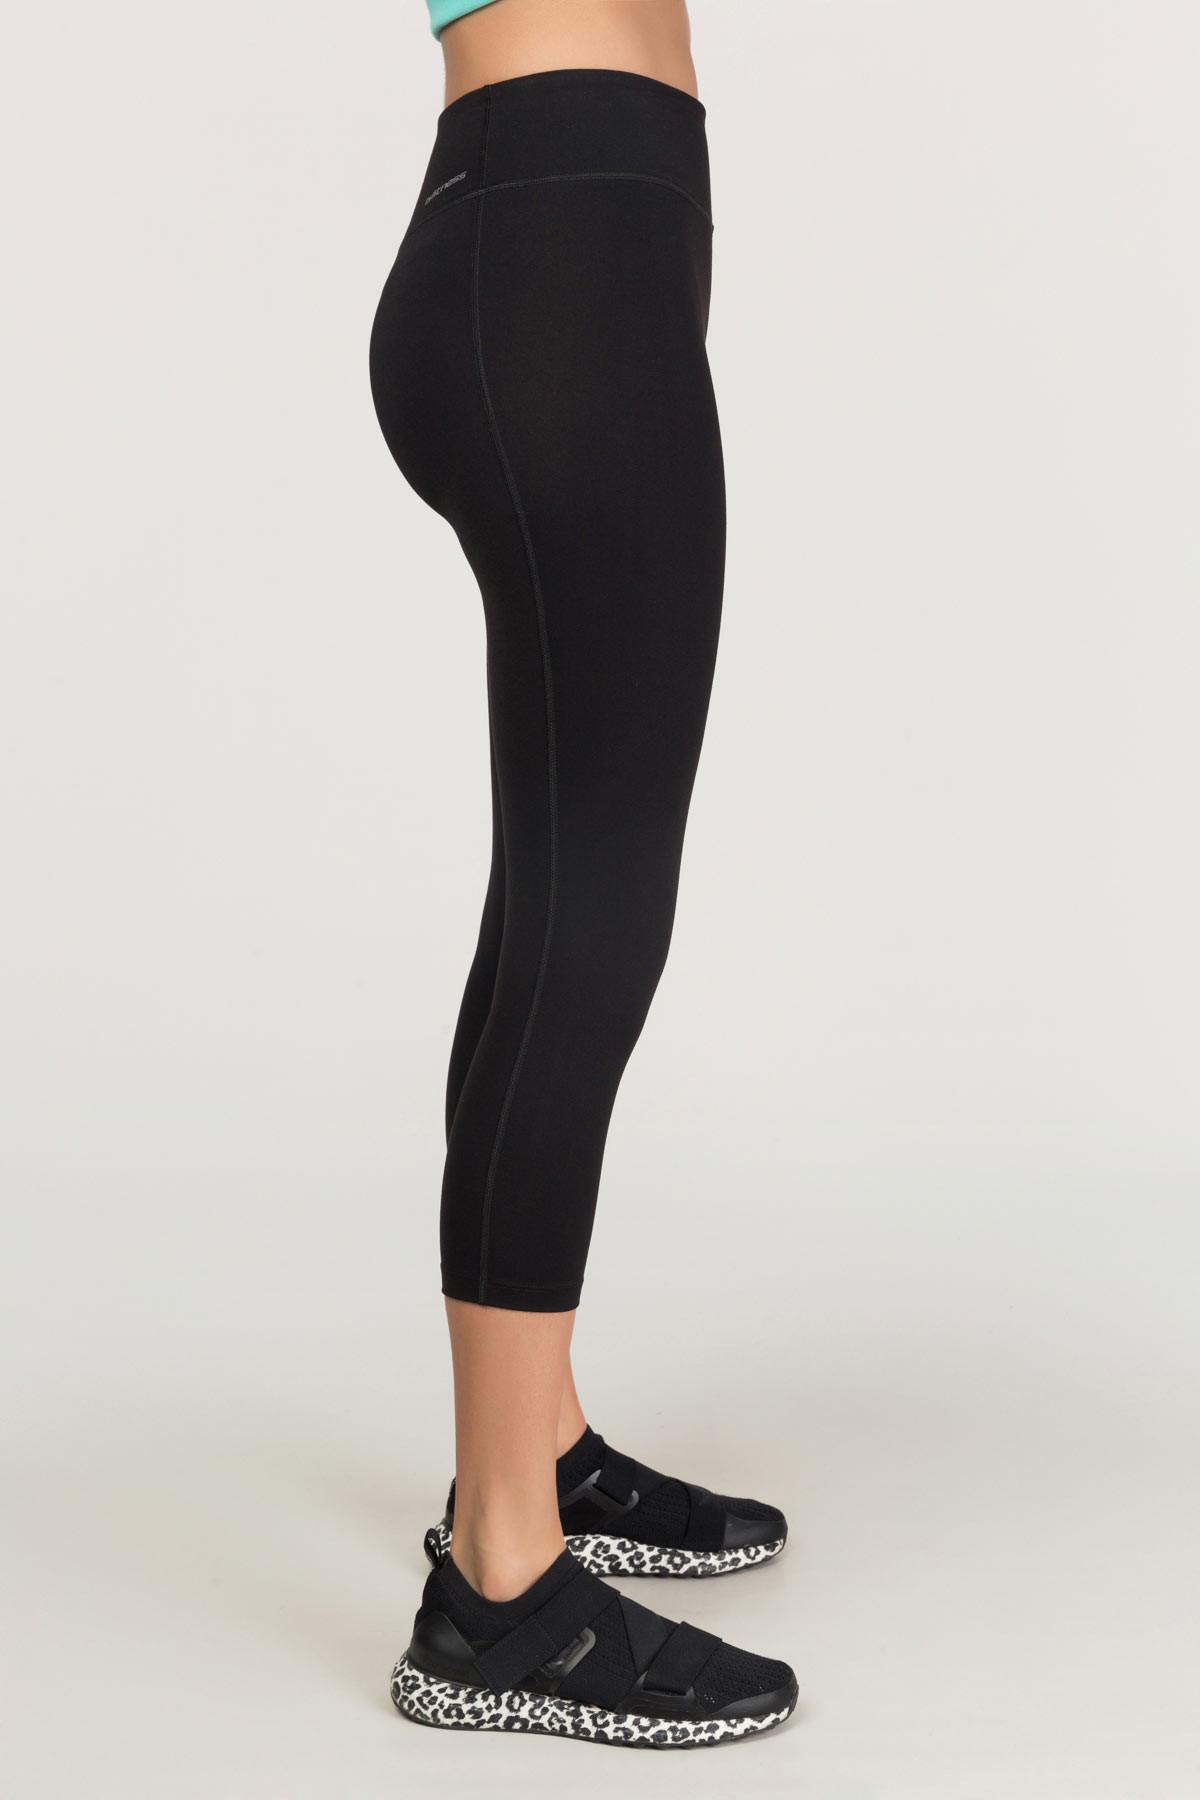 Bilcee 3/4 Kısa Sporcu Kadın Taytı DS-1740 BİLCEE